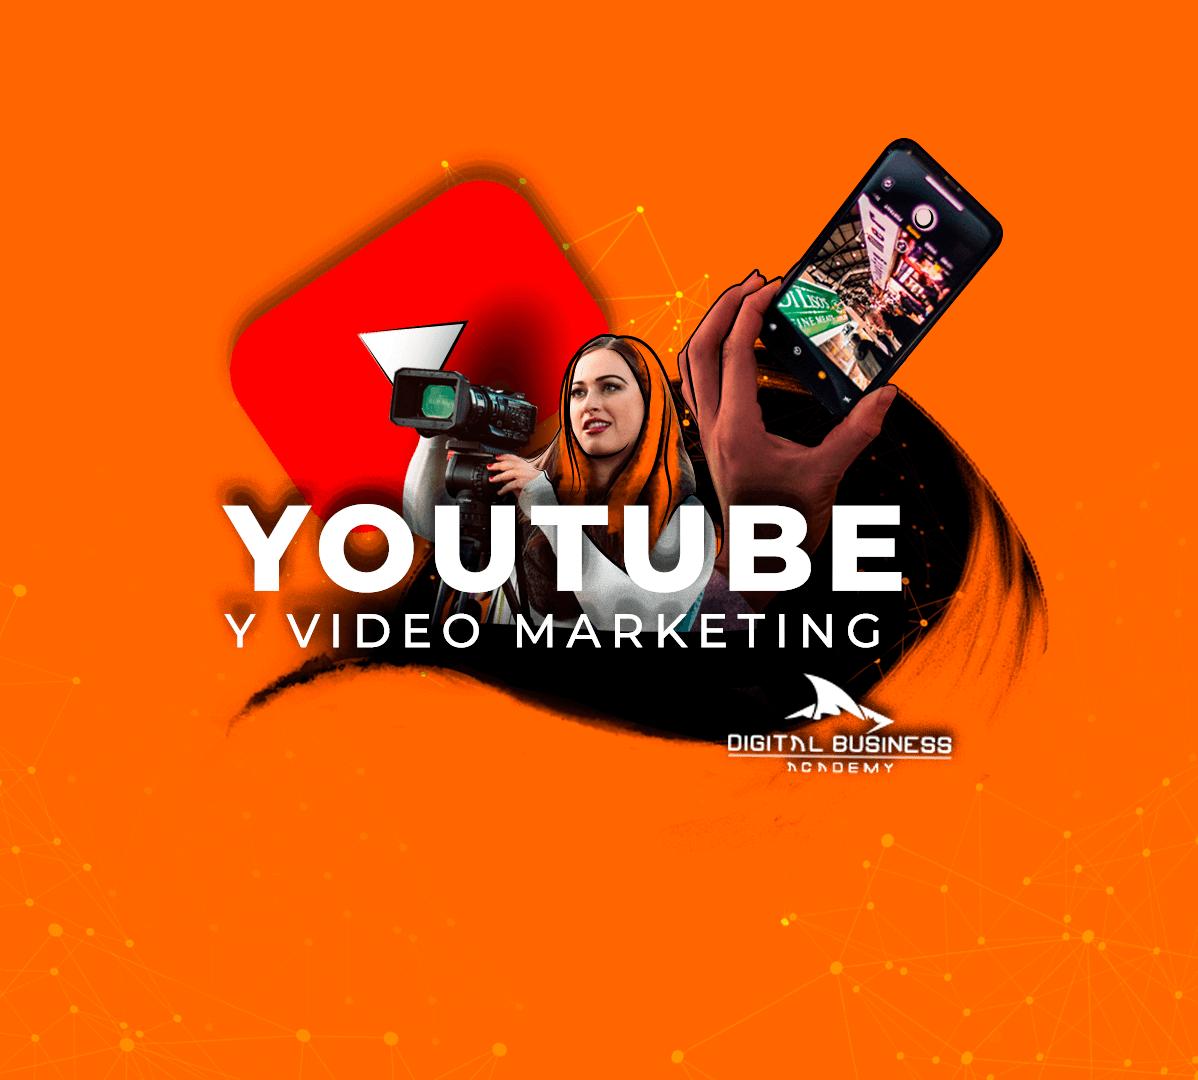 curso-de-video-marketing